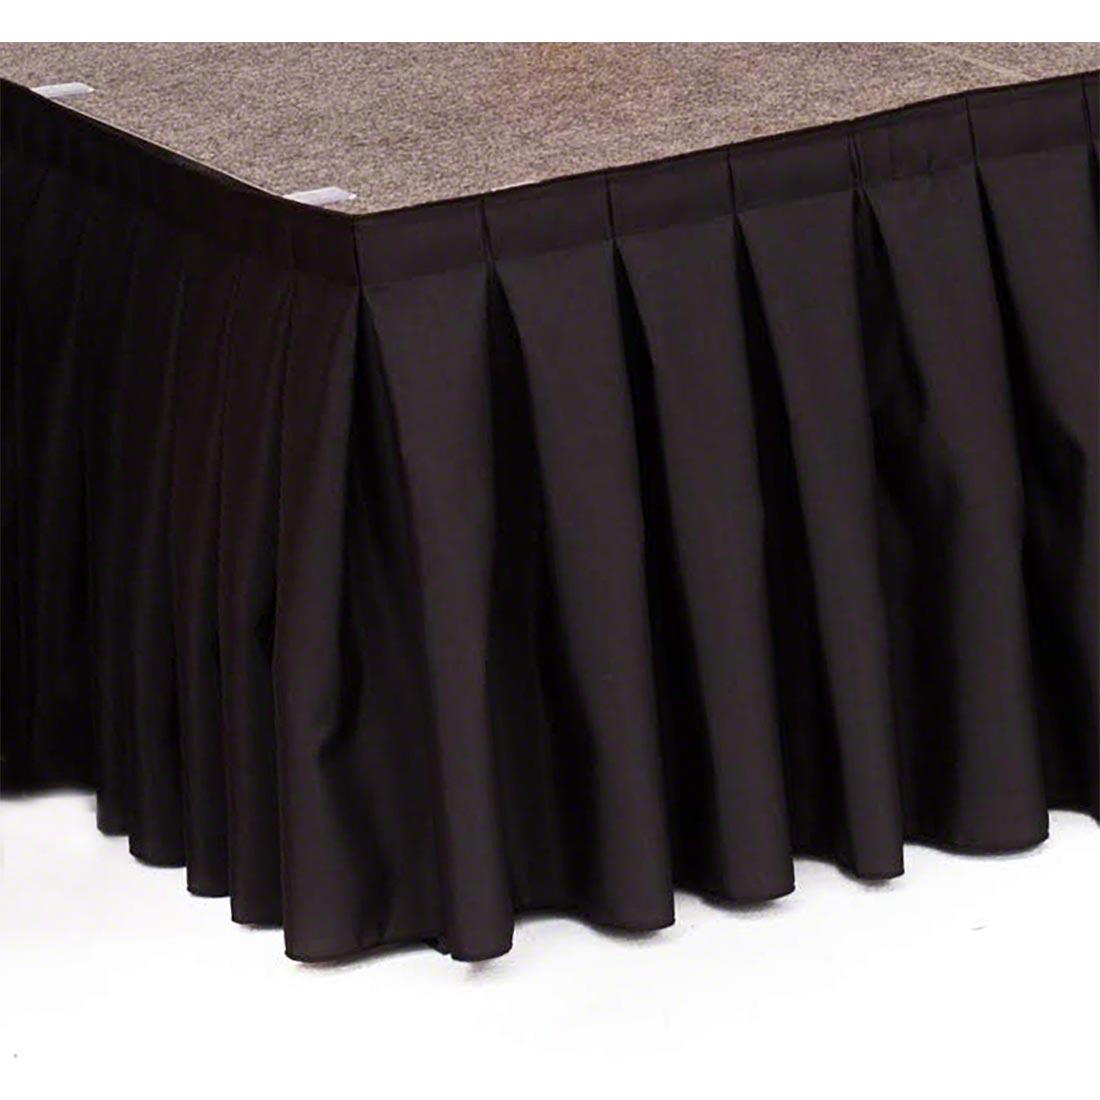 Ameristage Box-Pleat Stage Skirt, 5'x17